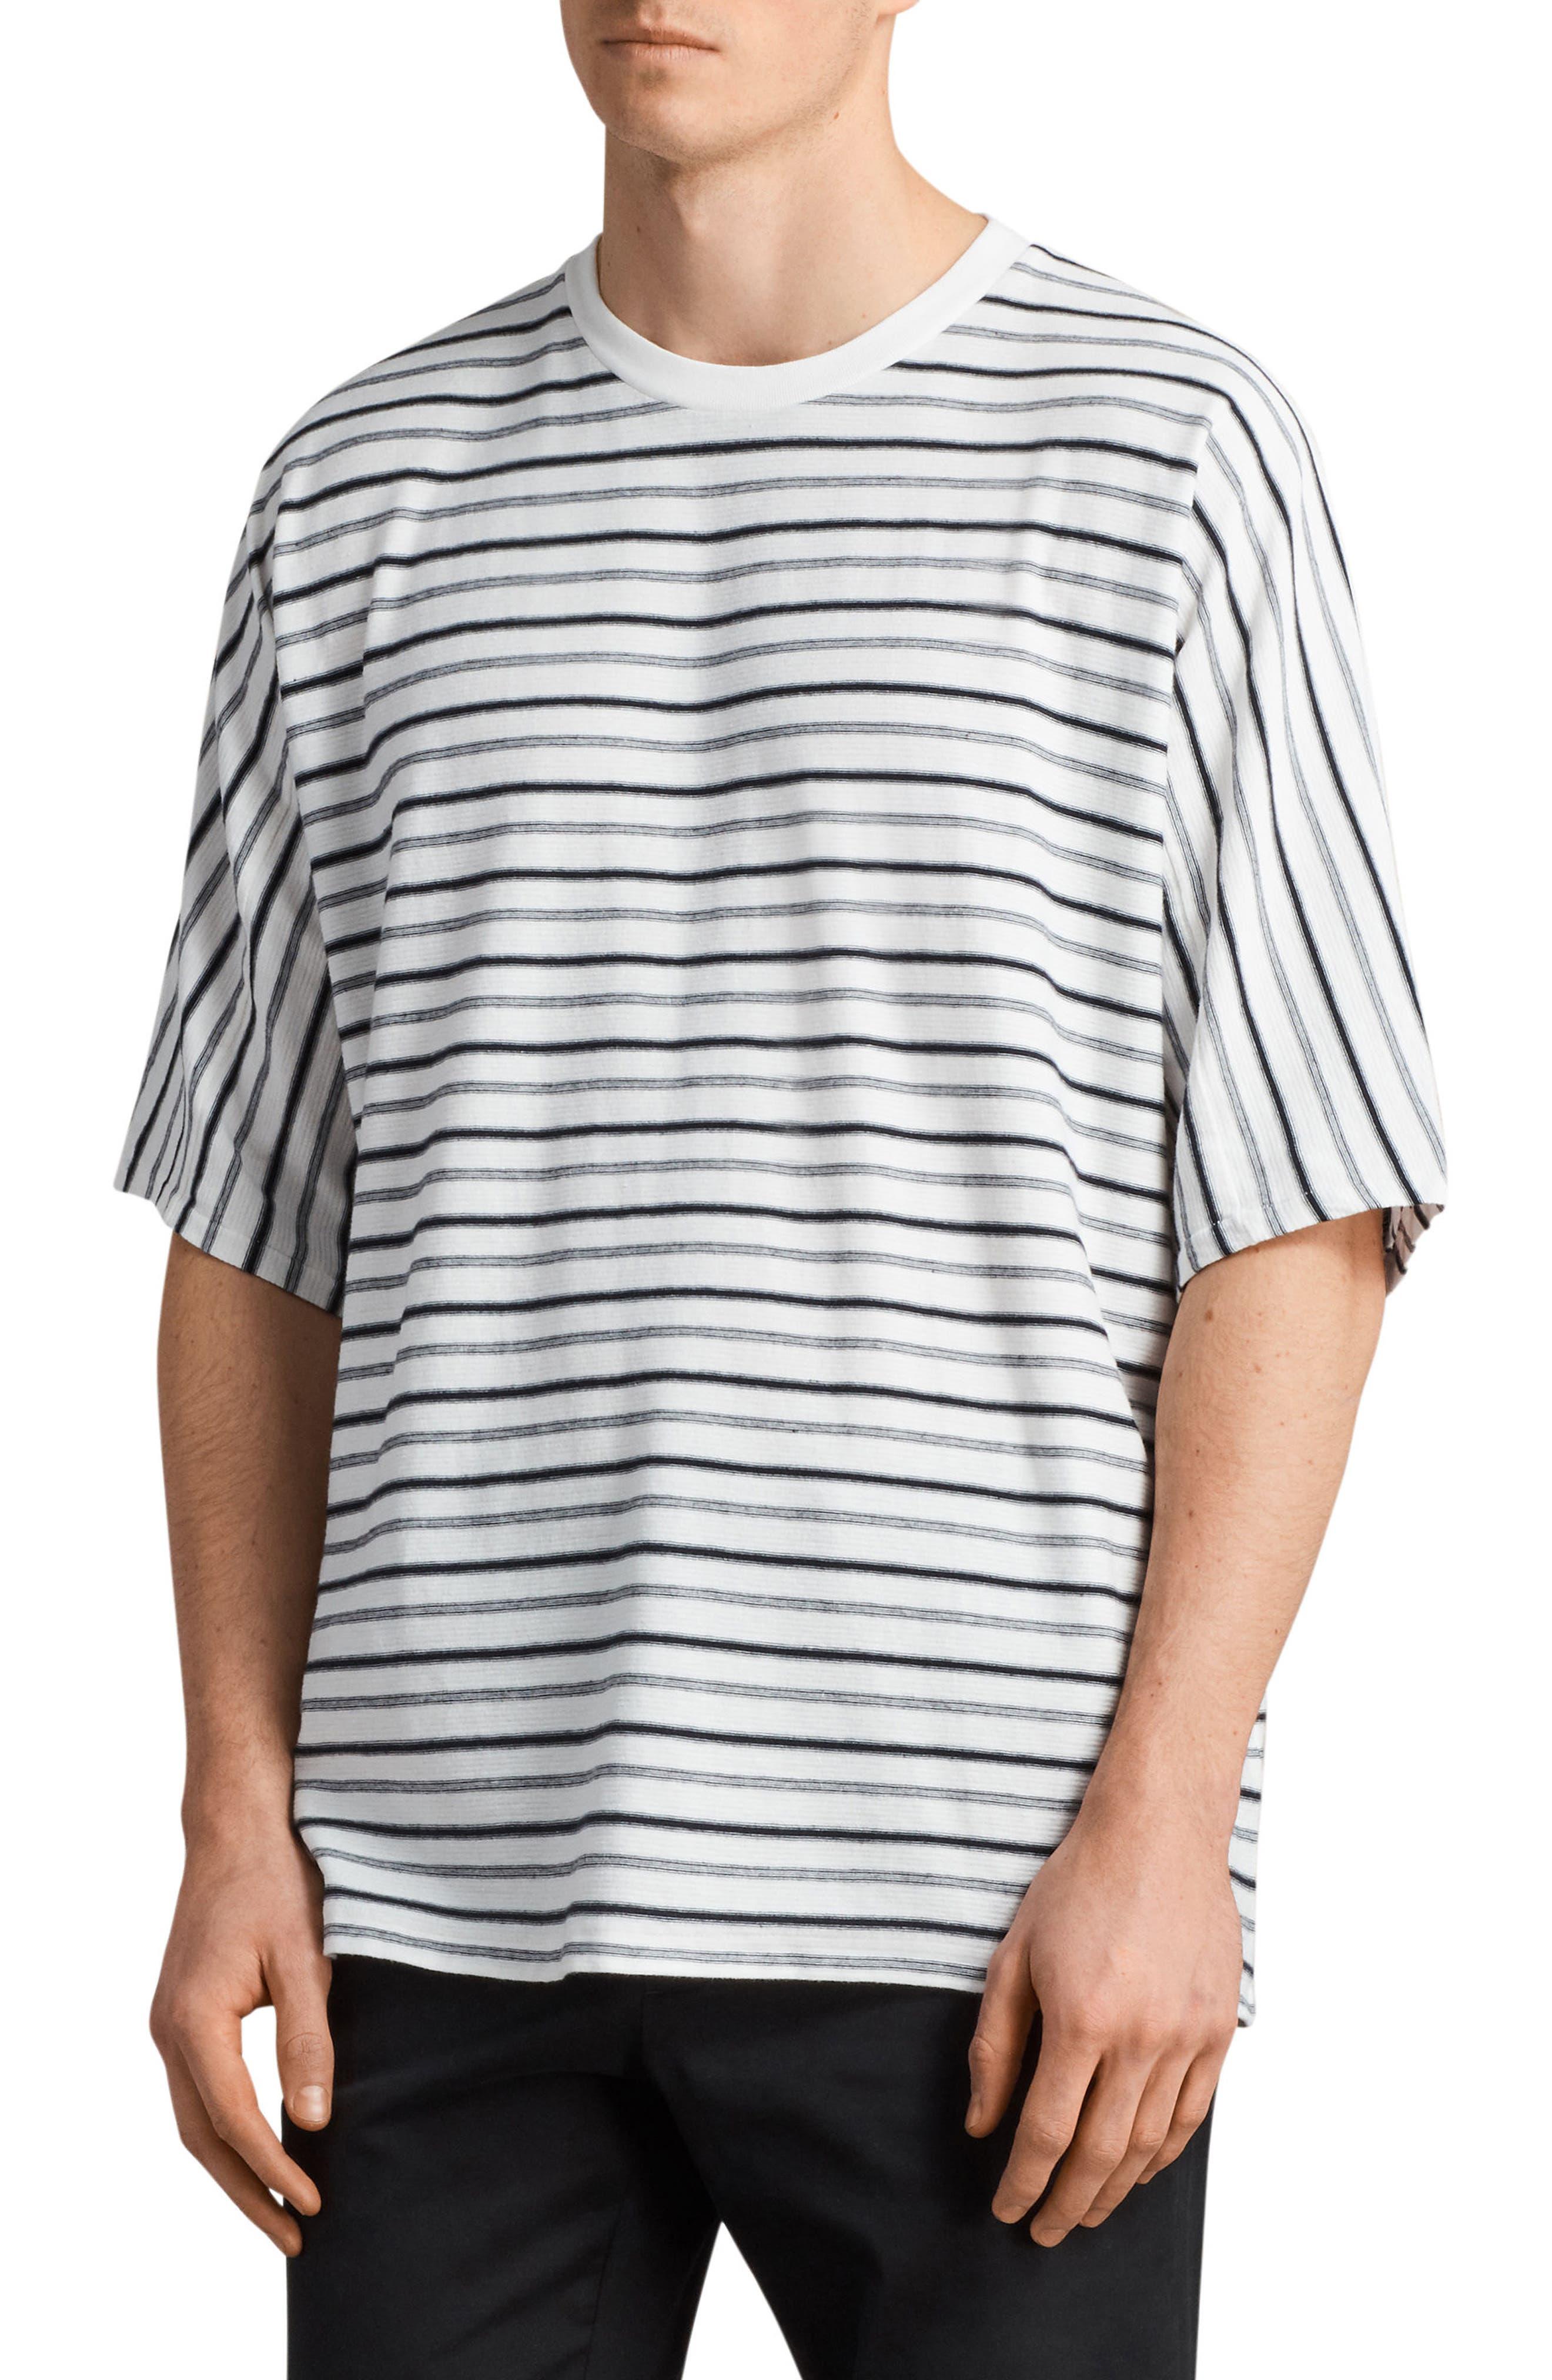 Jules Oversize Stripe T-Shirt,                             Alternate thumbnail 3, color,                             Chk White/ Ink Navy